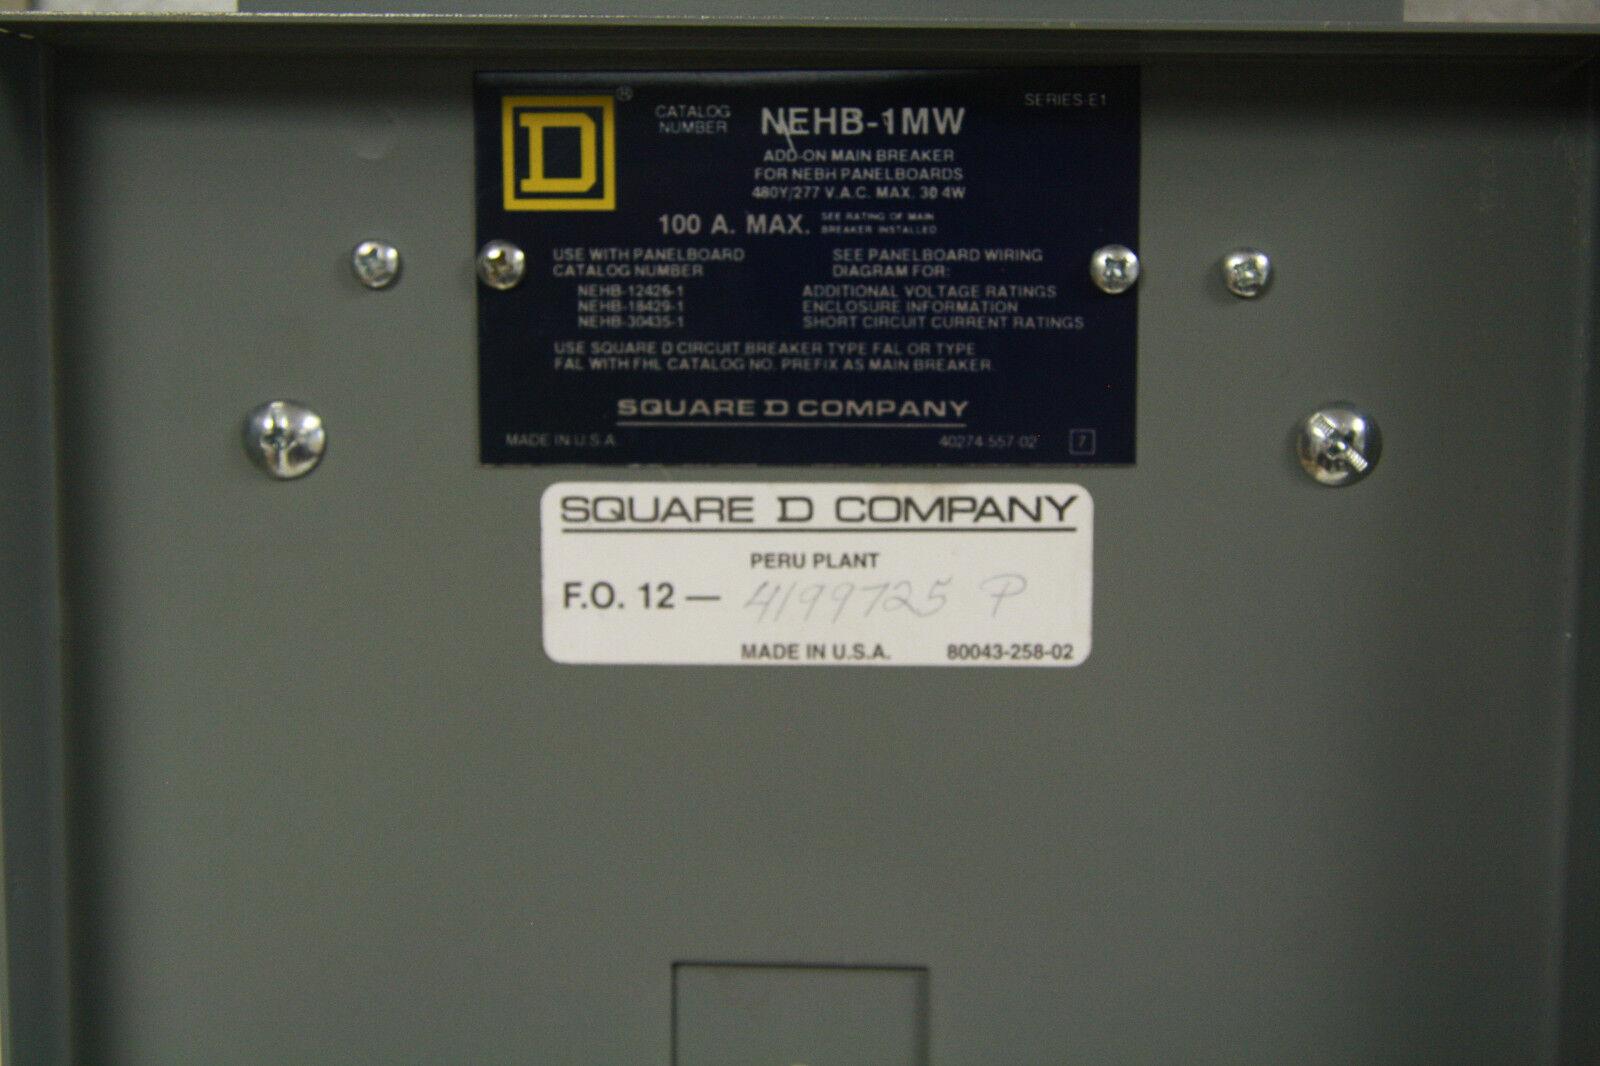 Square D Hehb Main Breaker Add On Kit Nehb1mw 100a Series E1 Ebay A Circuit